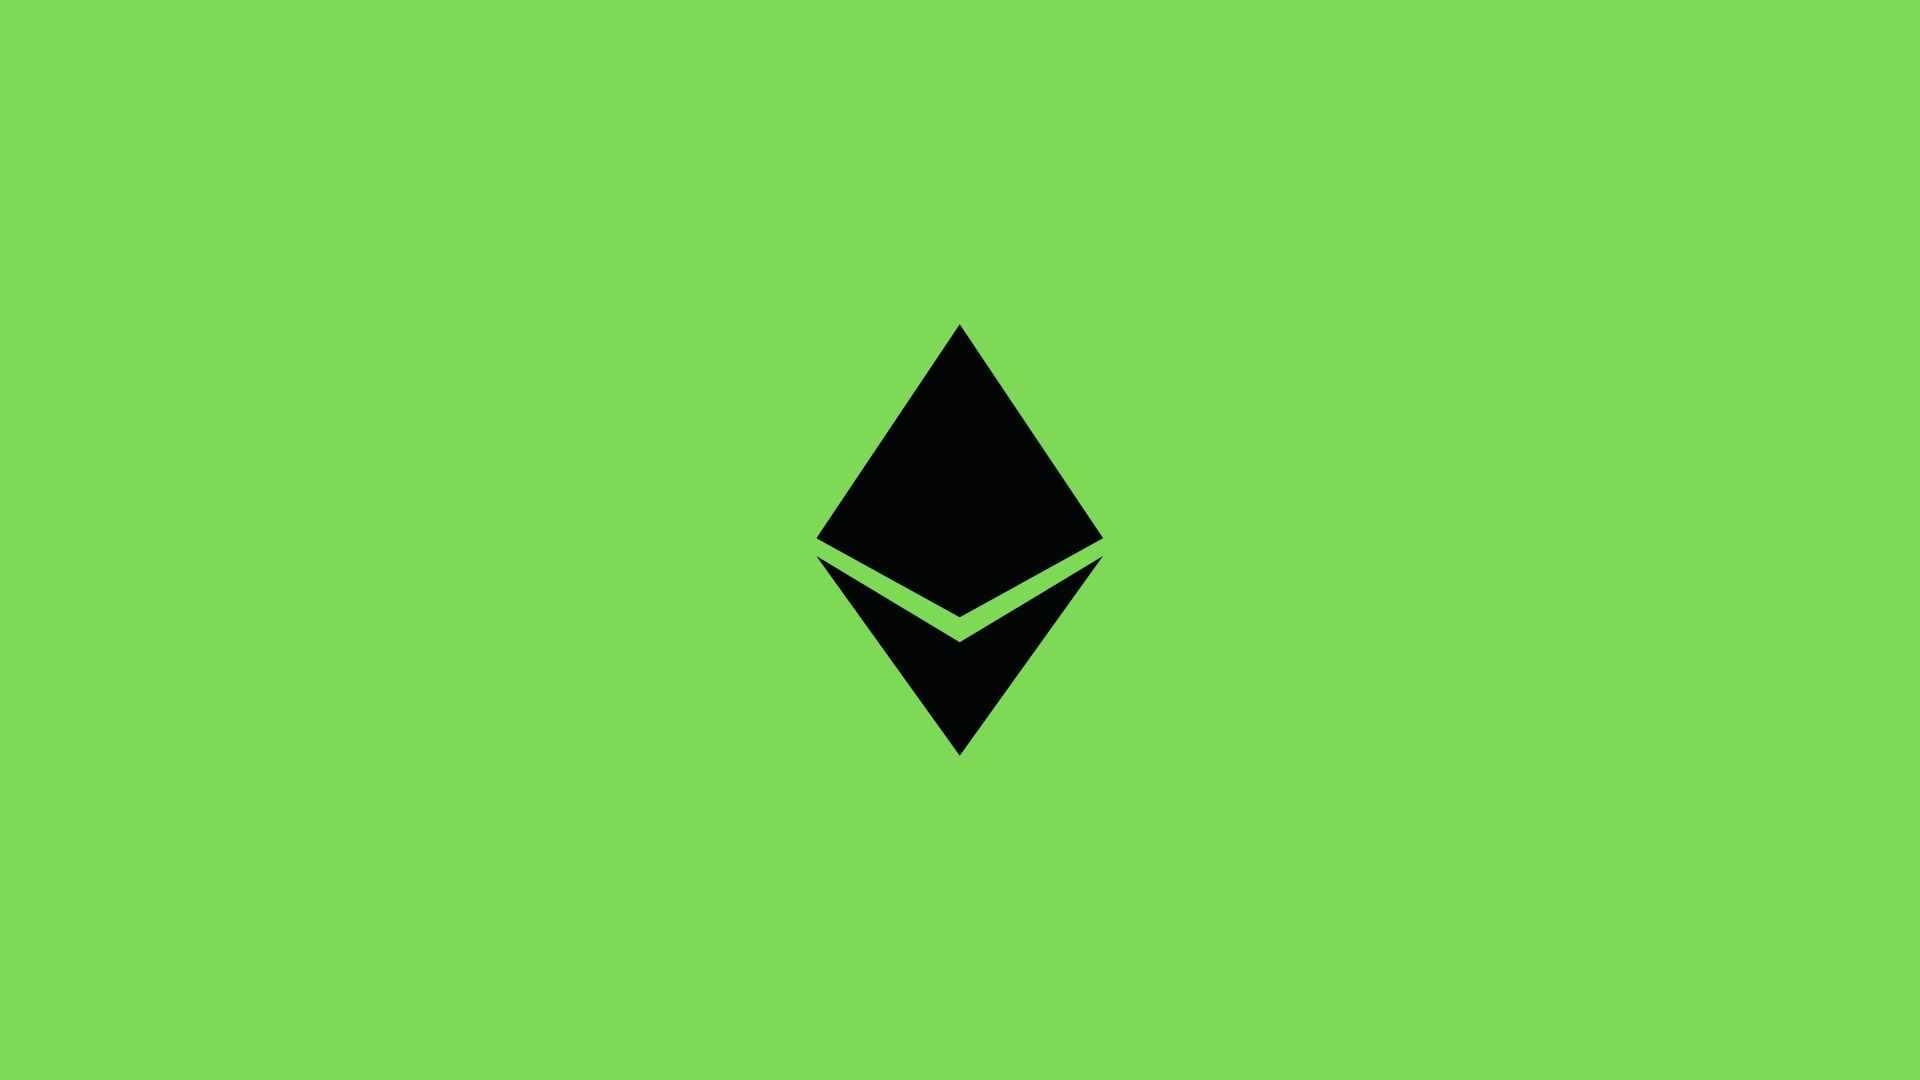 ETH Ethereum price today ethereum stock price daily indicator